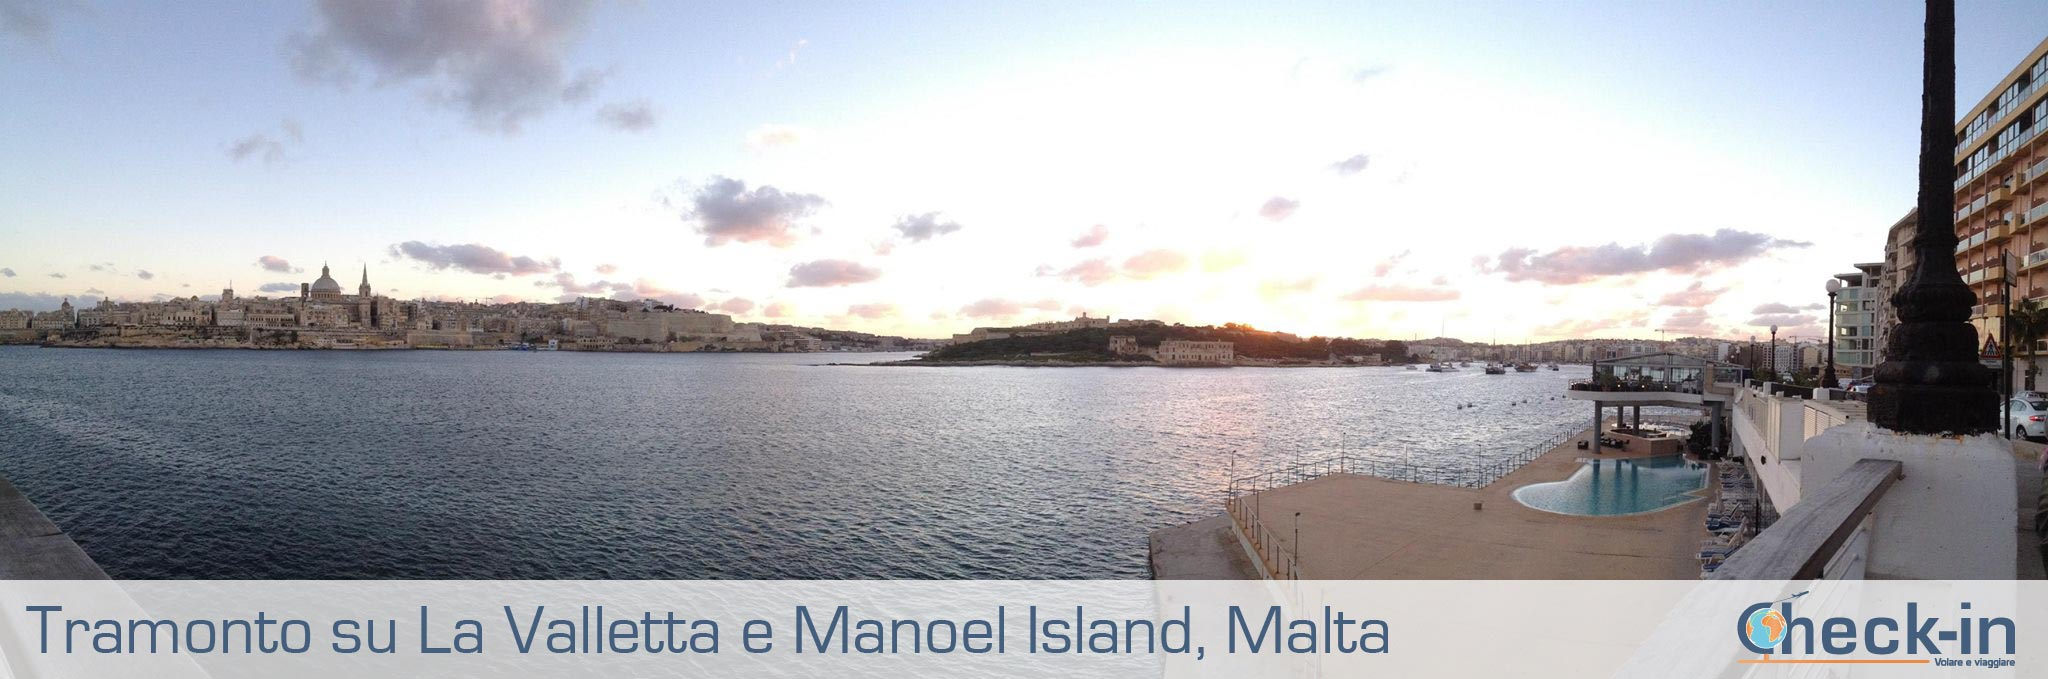 Malta e Gozo: tramonto su La Valletta e Manoel island